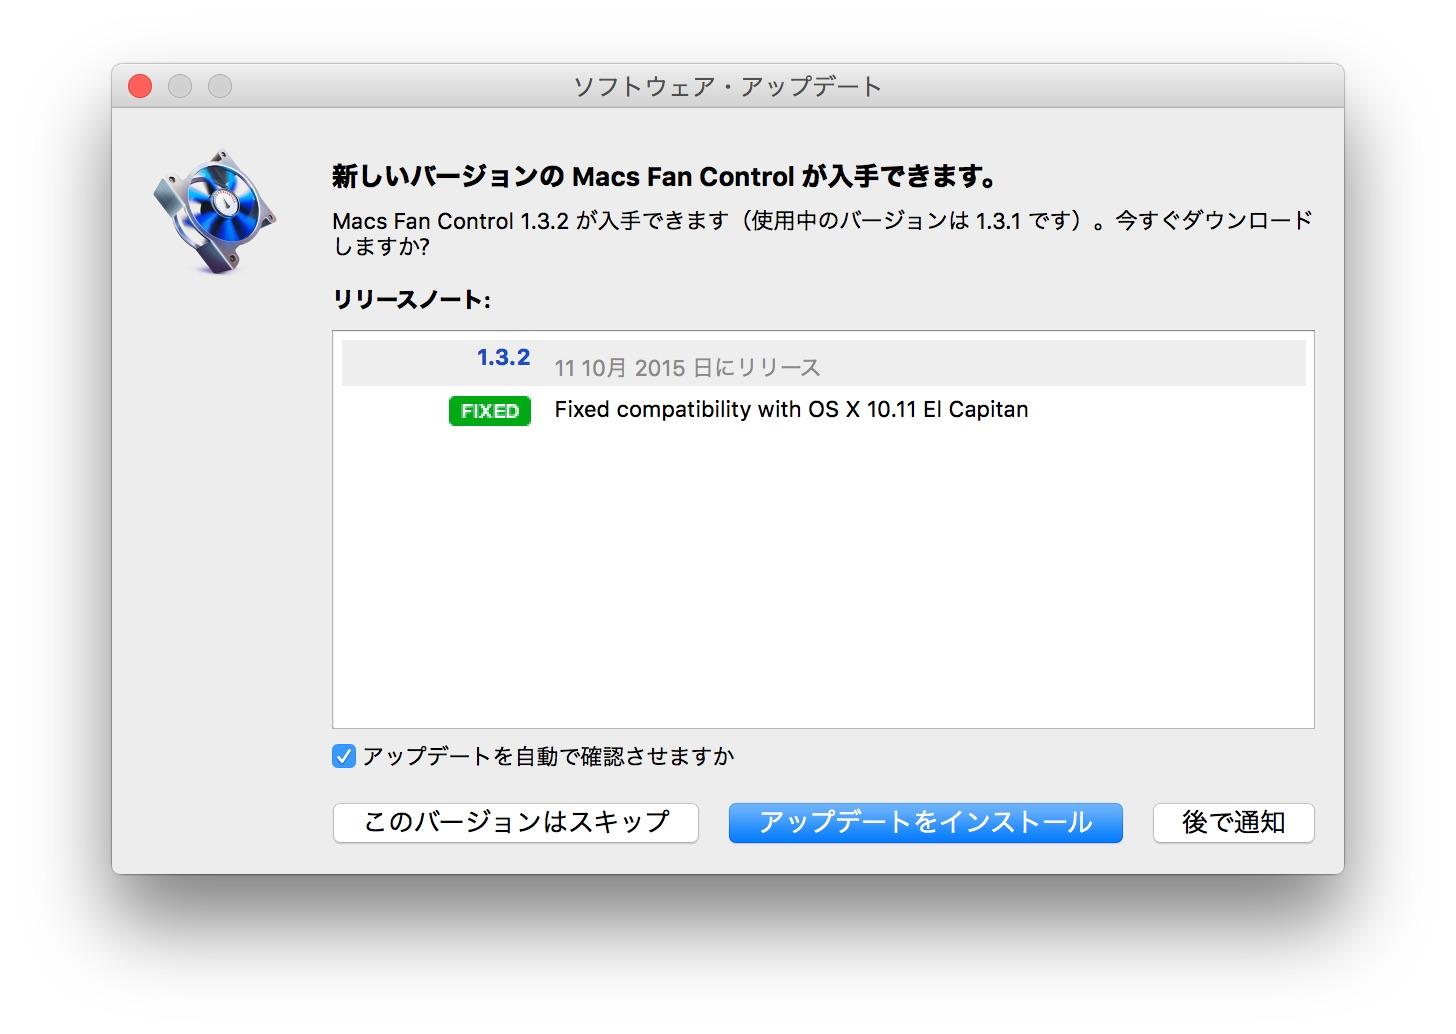 Macs-Fan-Control-Hero